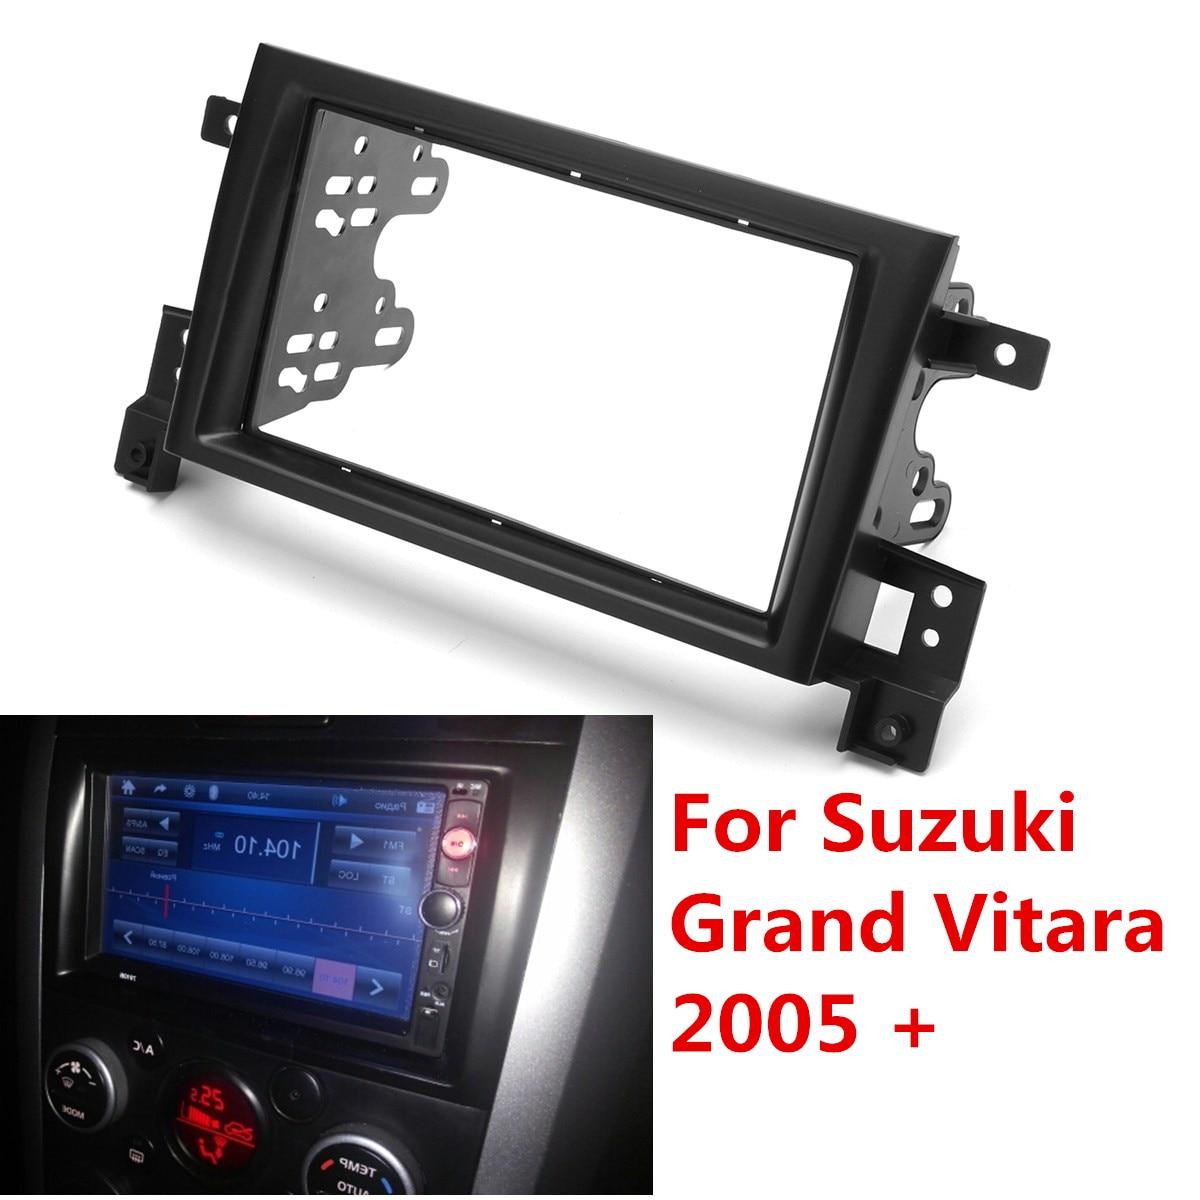 2 Din Car Interior Radio Fascia Fascias Panel Frame CD DVD Dash Audio Cover For Suzuki Grand Vitara 2005 2006 2007 2008 - 2018